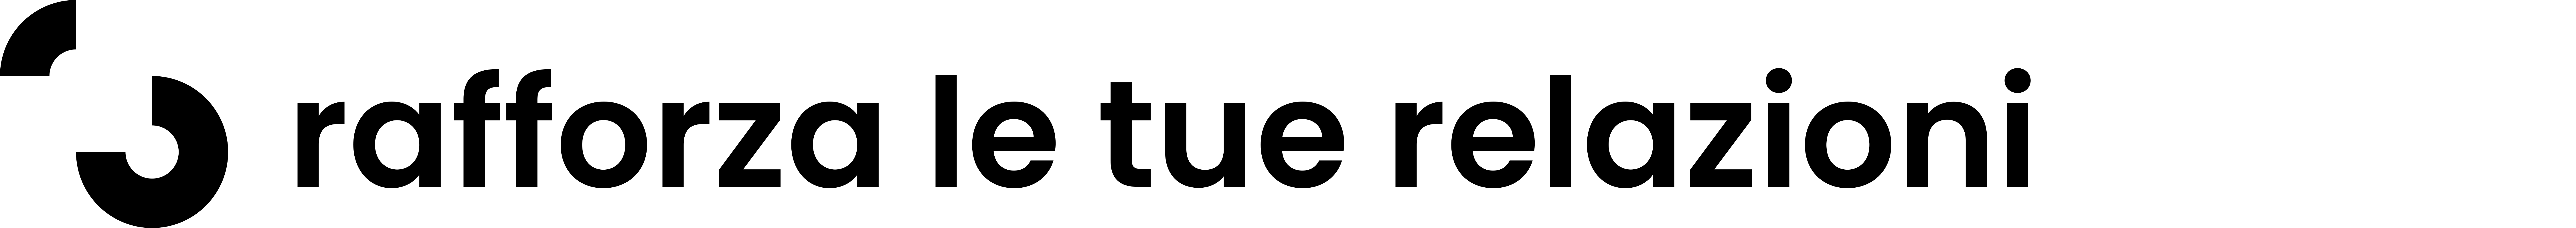 Logo_RRE_Positivo-1